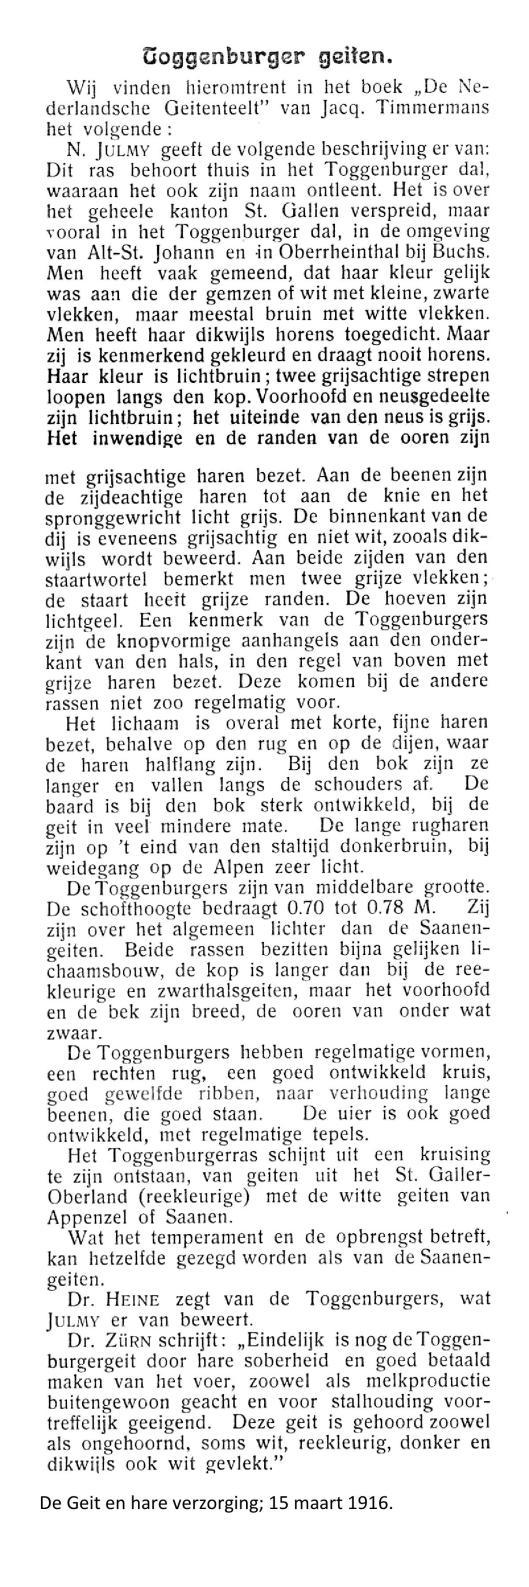 weblog; De Geit en hare verzorging. 1916 Toggenburger geiten.